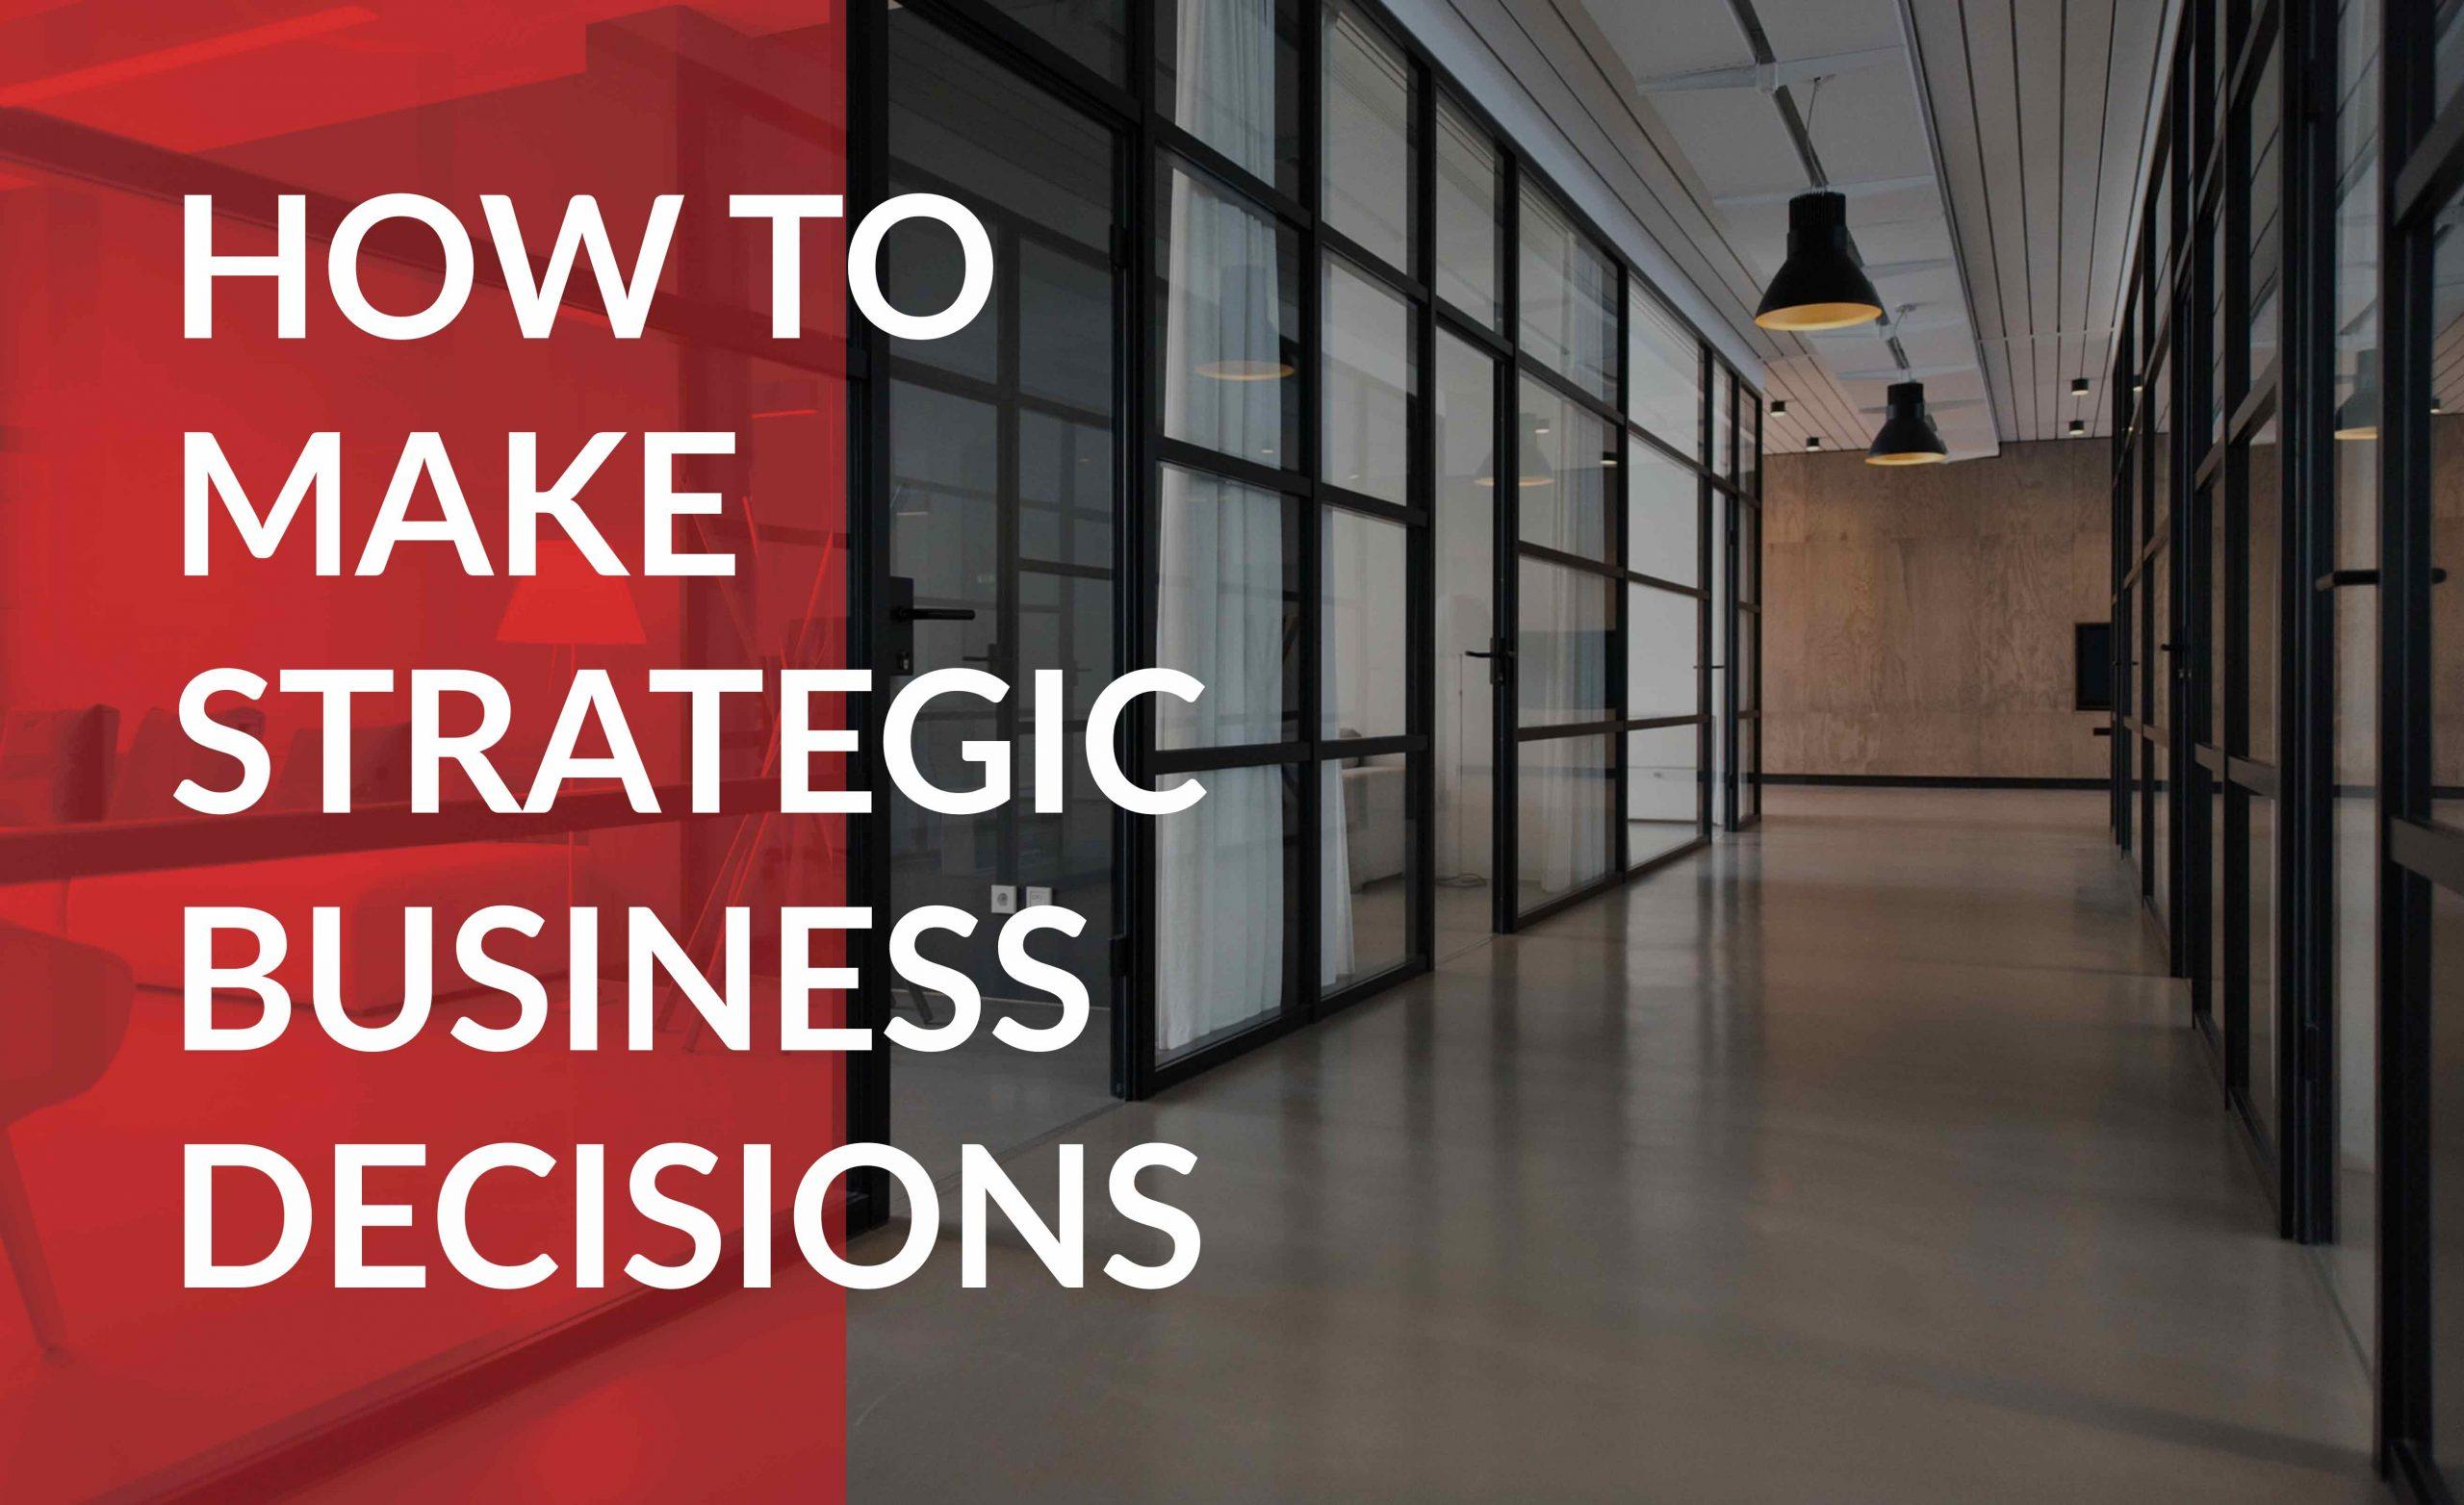 Make strategic business decisions